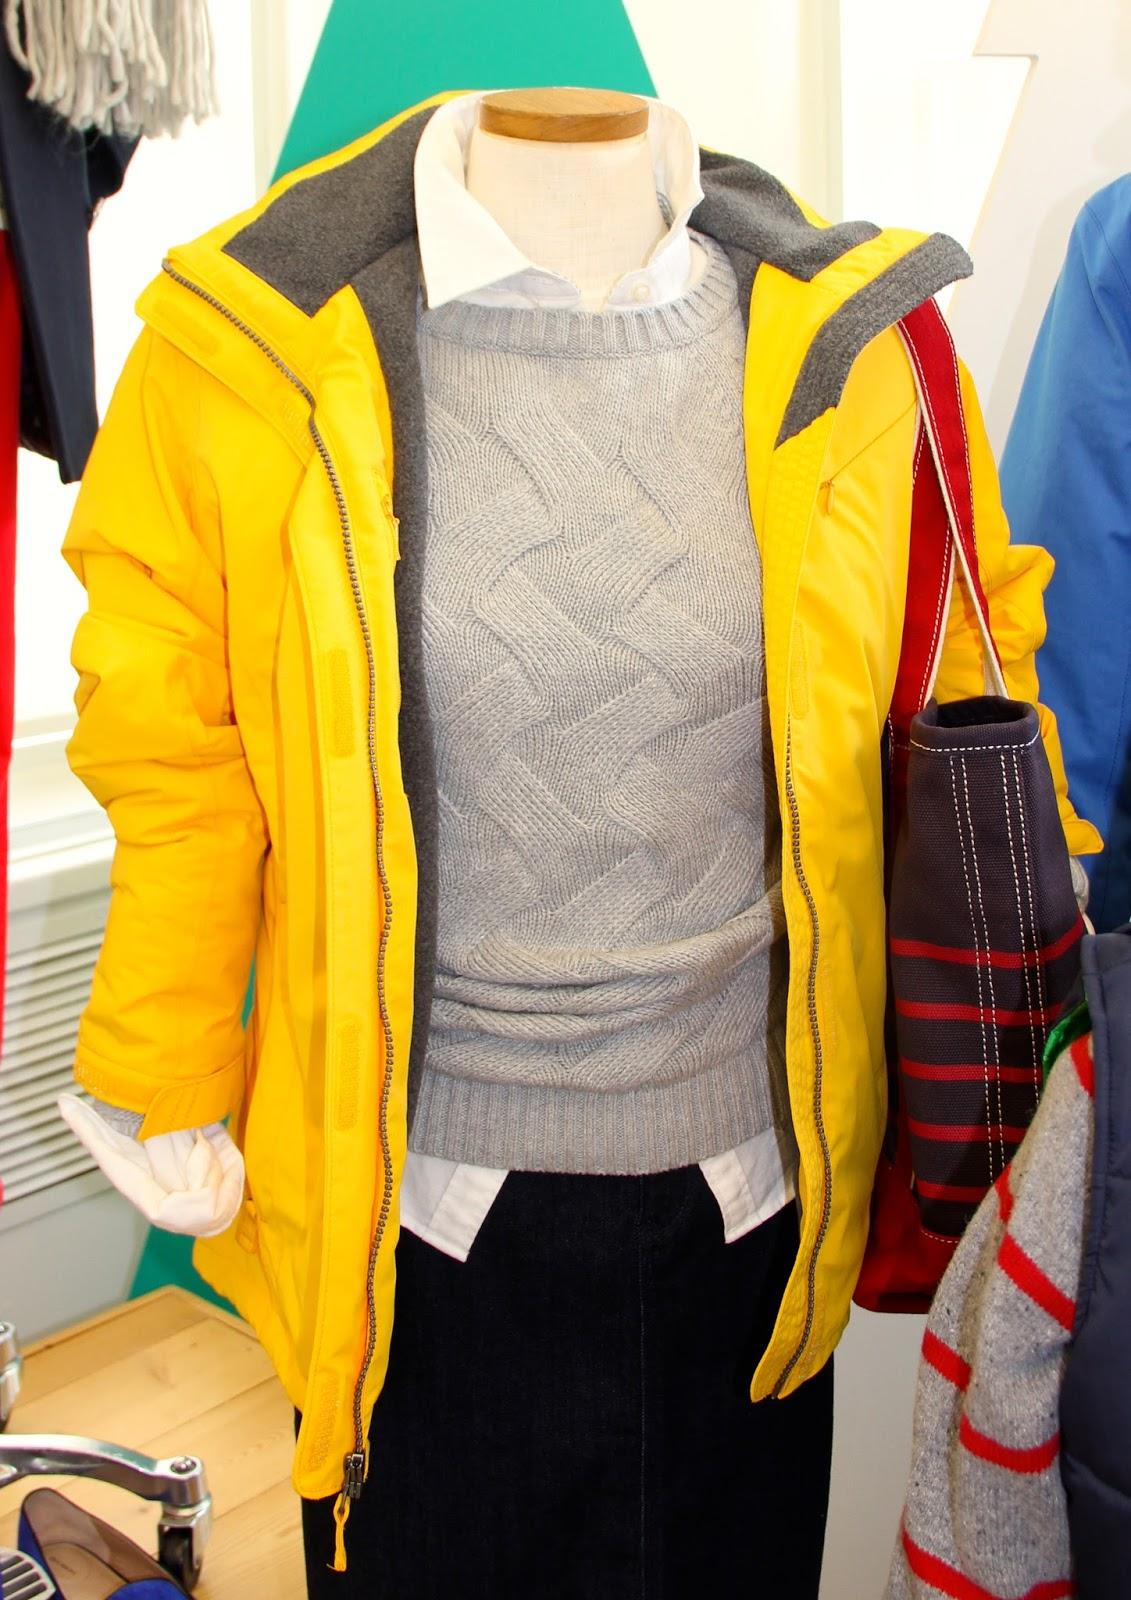 Canada Goose' nomad storm jacket - men's